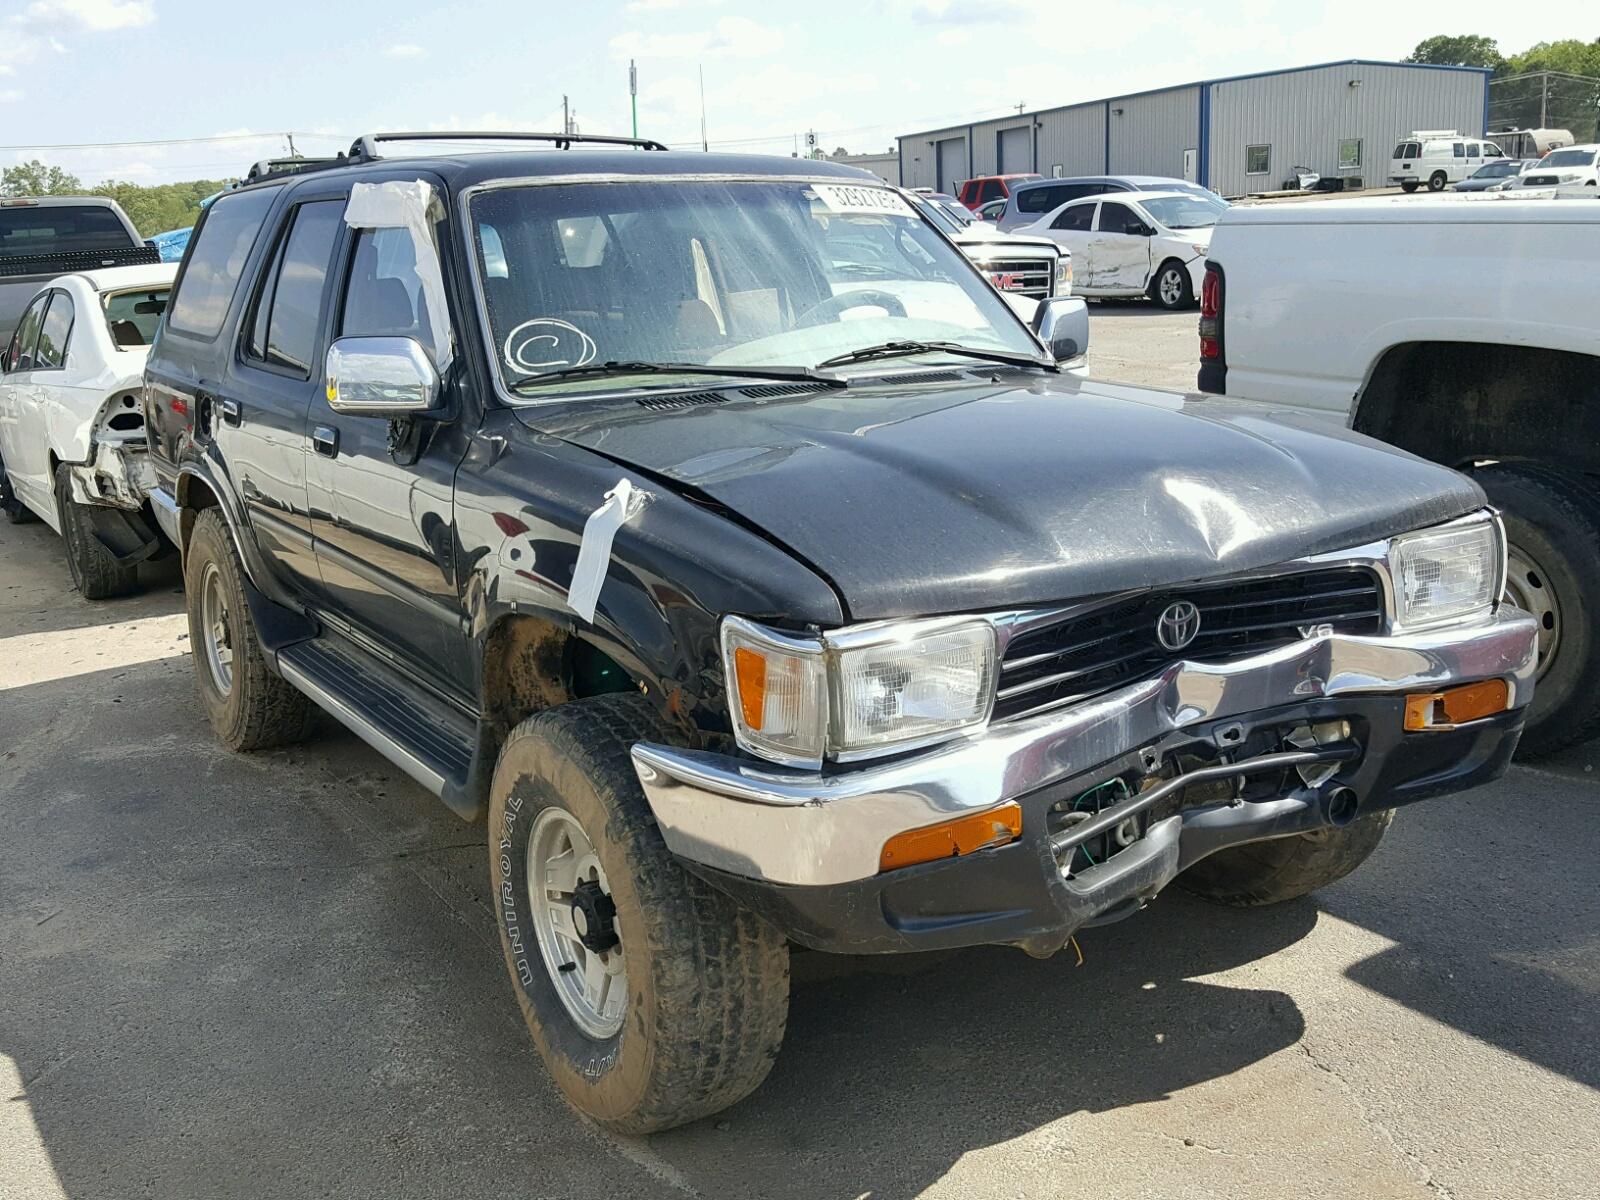 Jt3vn39w0r0153737 1994 Black Toyota 4runner Vn On Sale In Ar 1984 1989 30l Left View